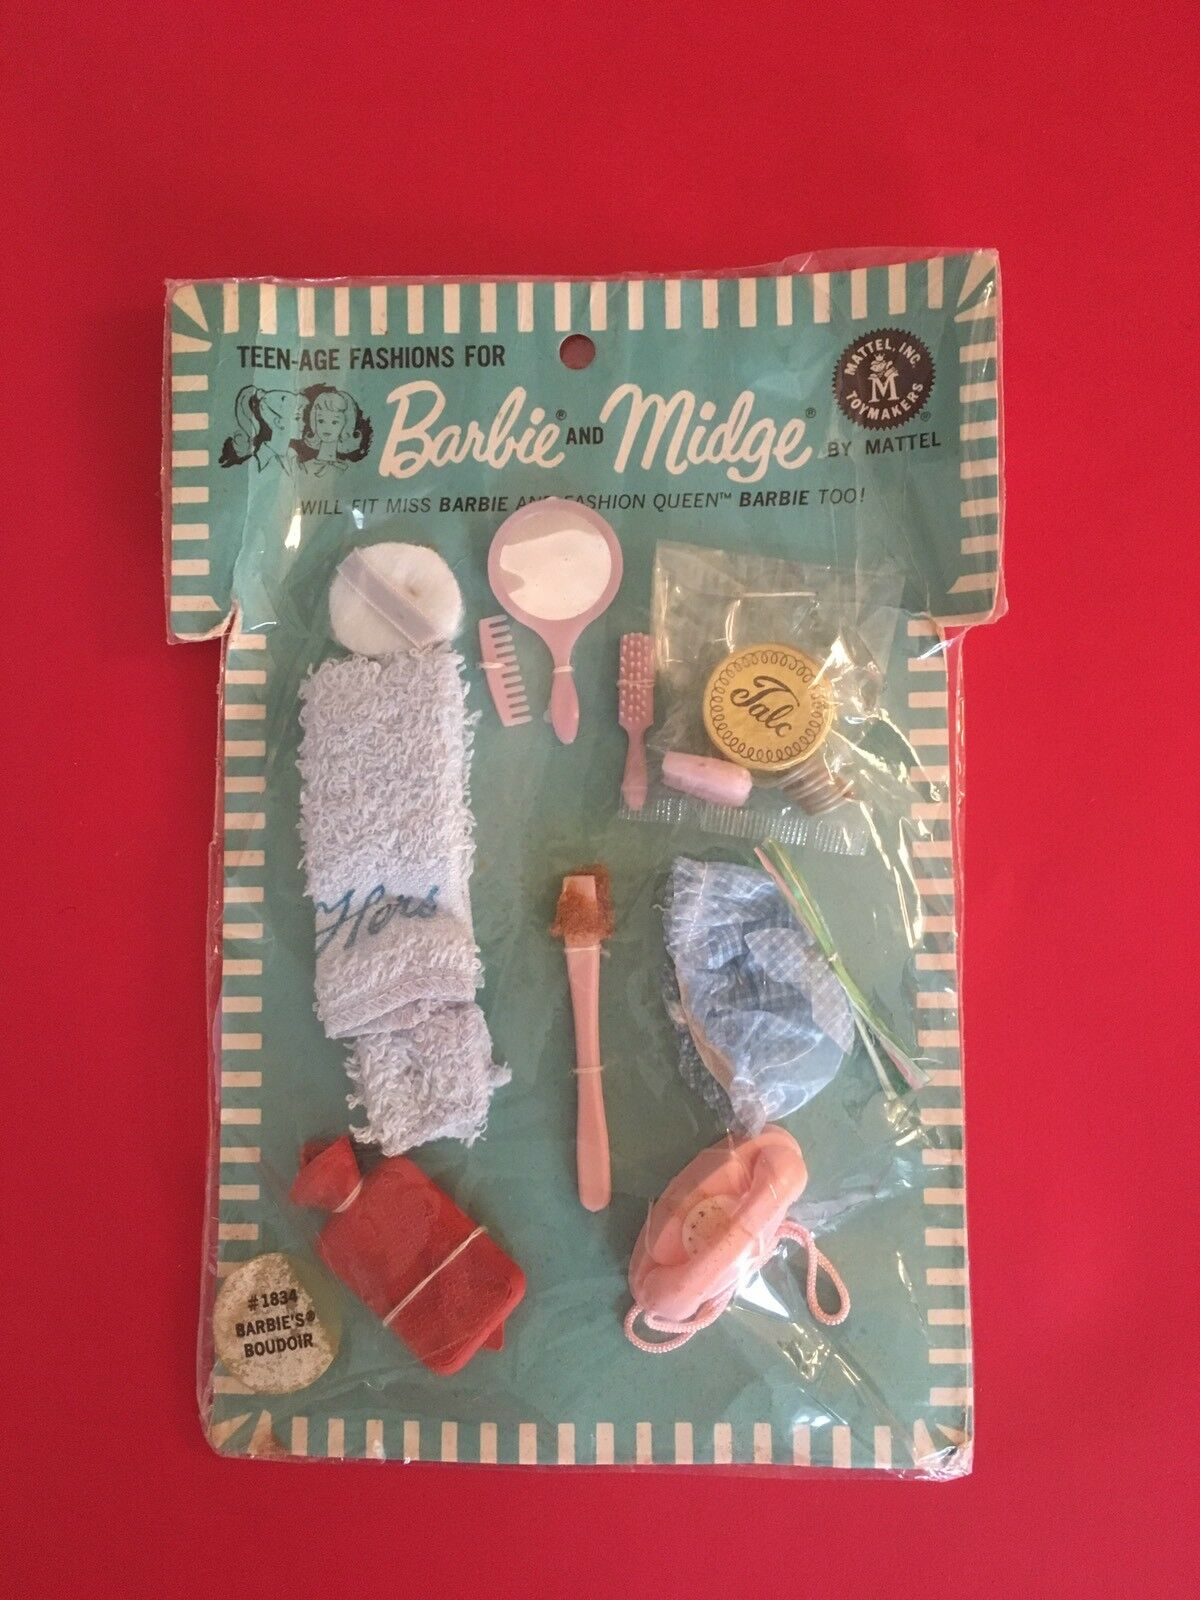 Barbie Vintage 1964 - Barbie's Boudoir Set BRAND NEW VHTF